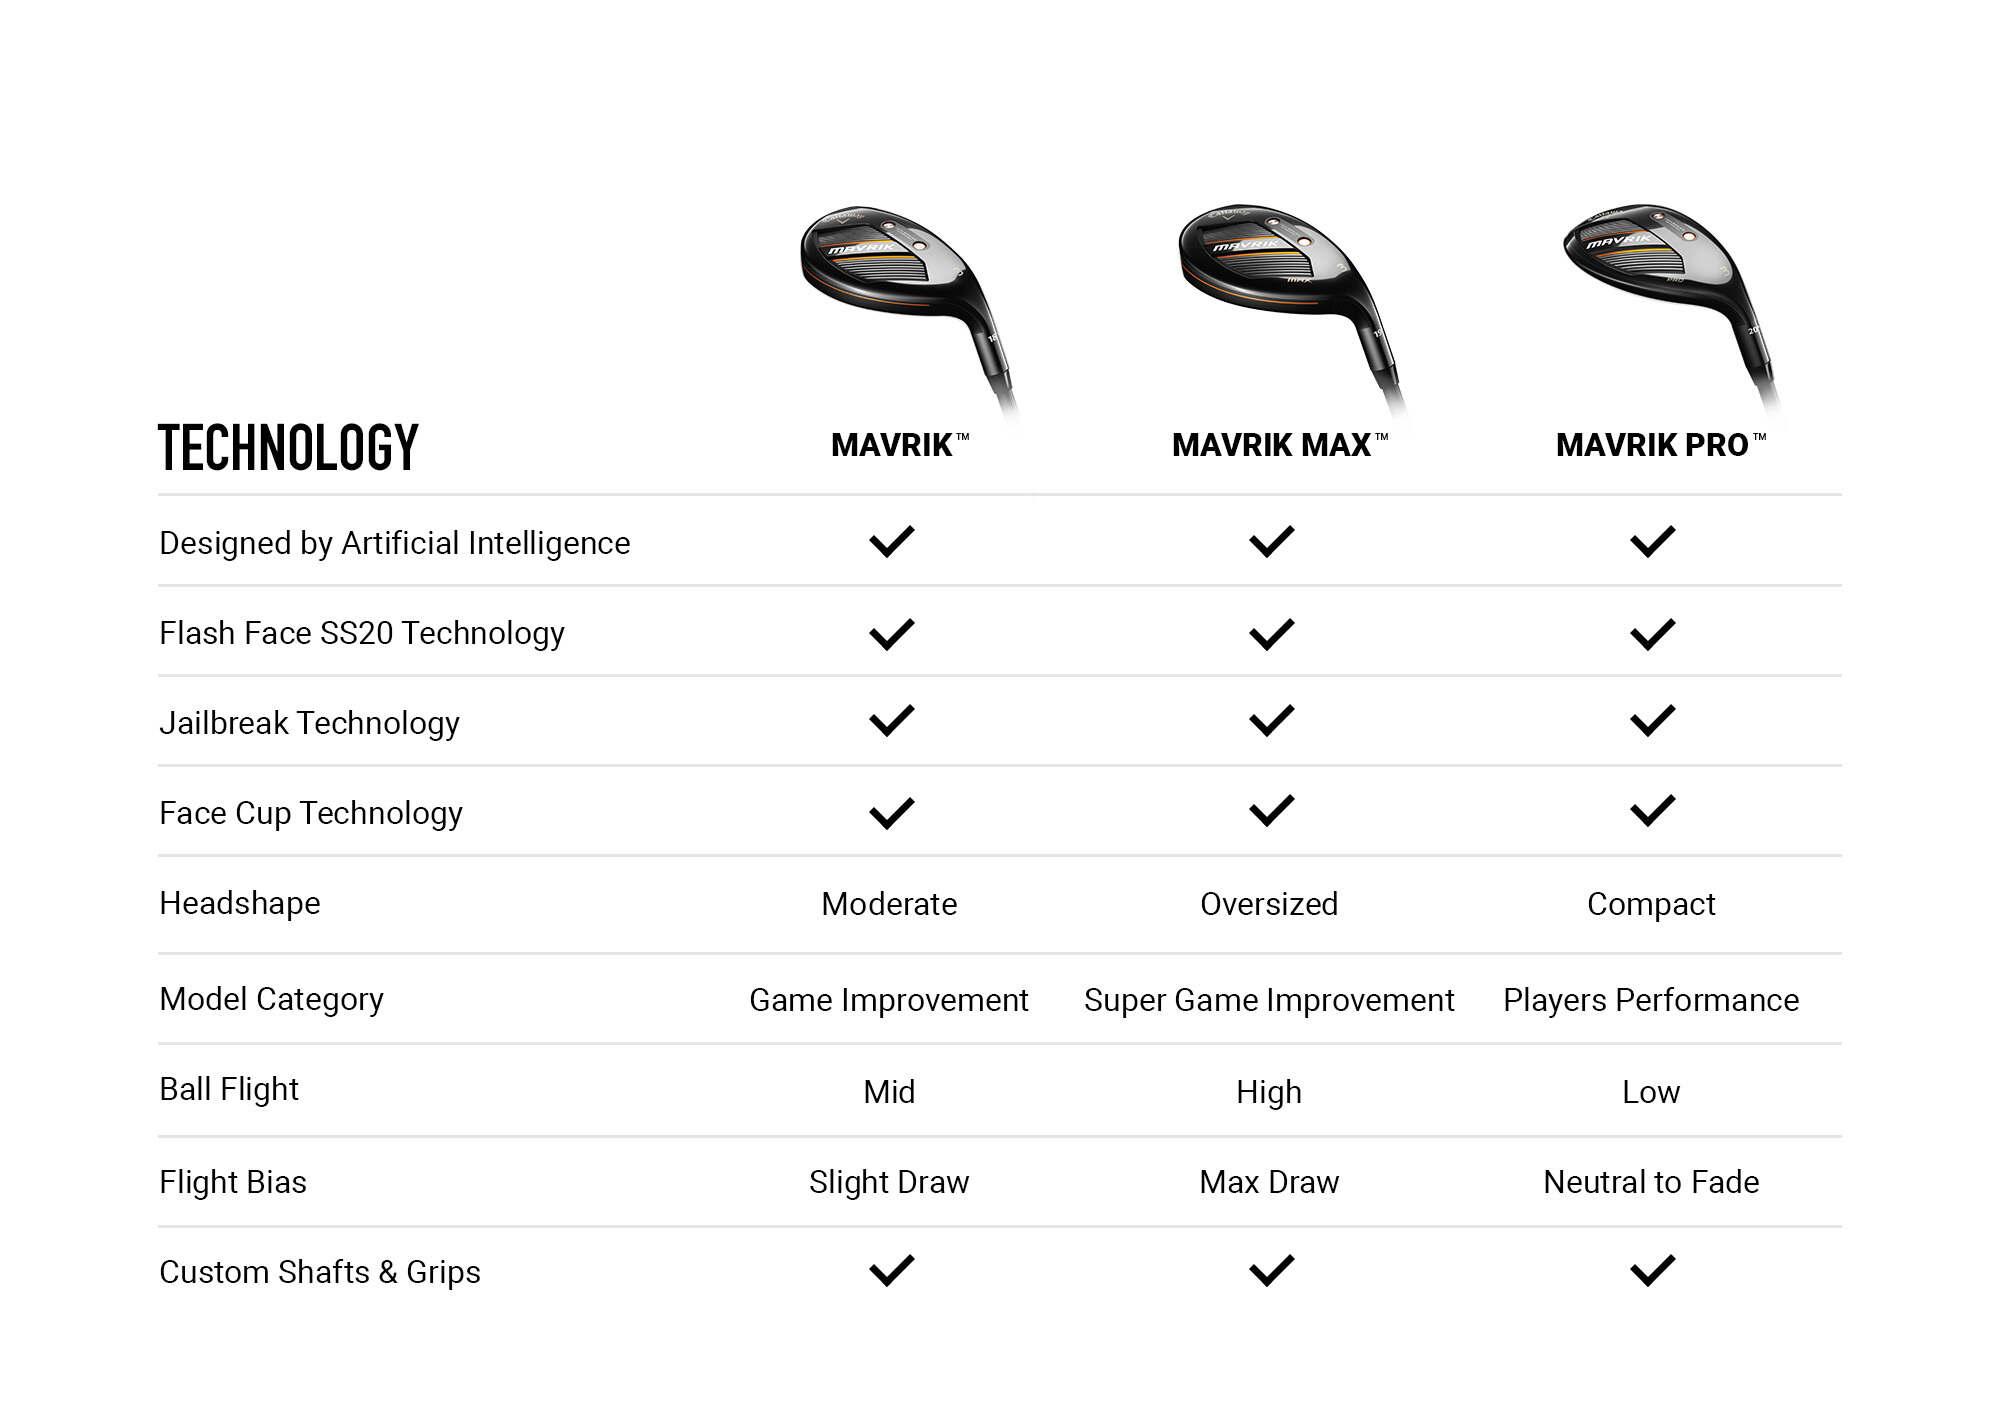 Callaway MAVRIK Hybrid Comparison Chart